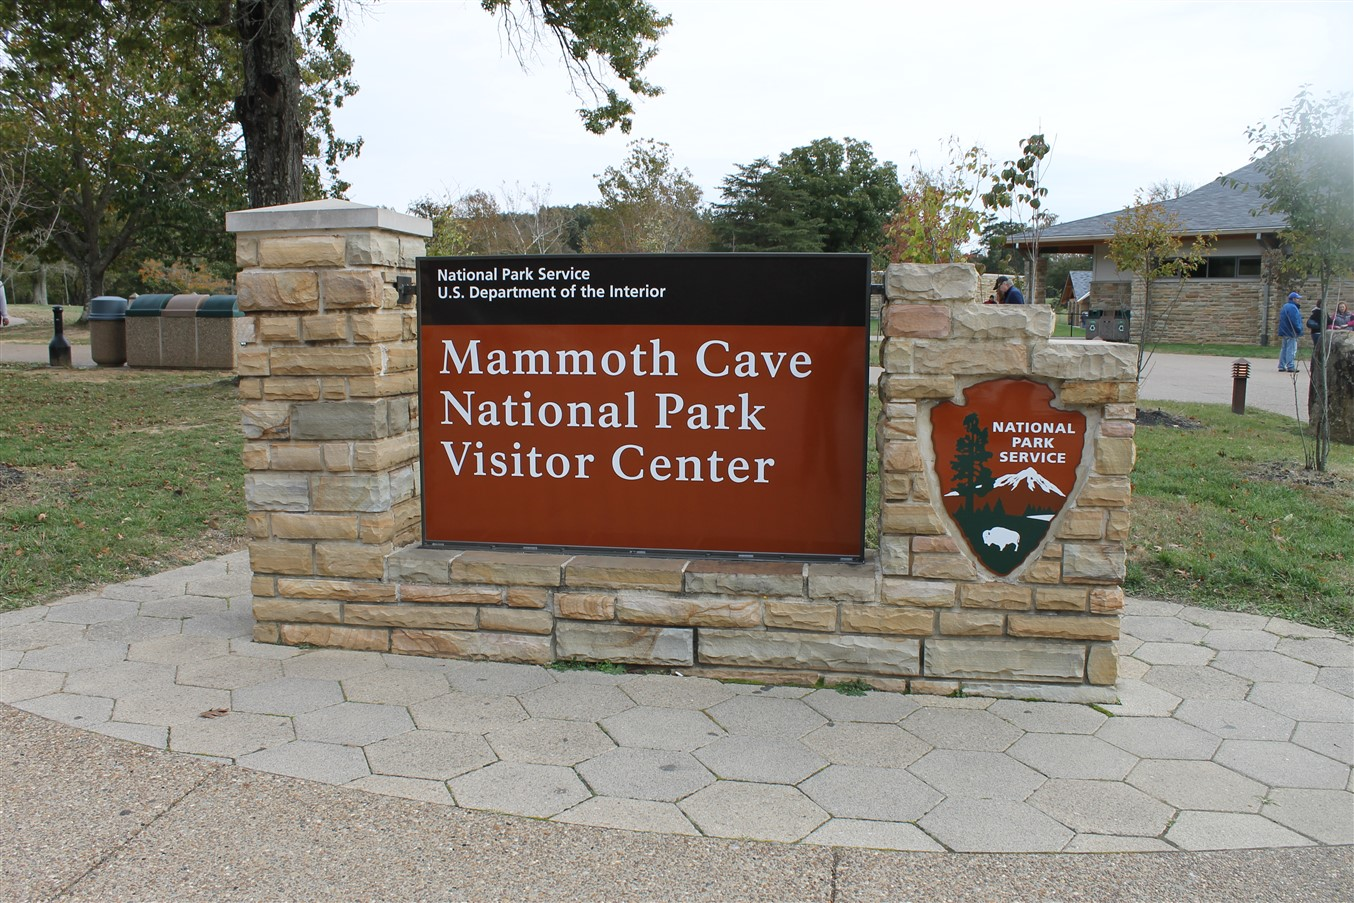 2013 10 26 94 Mammoth Cave KY.jpg